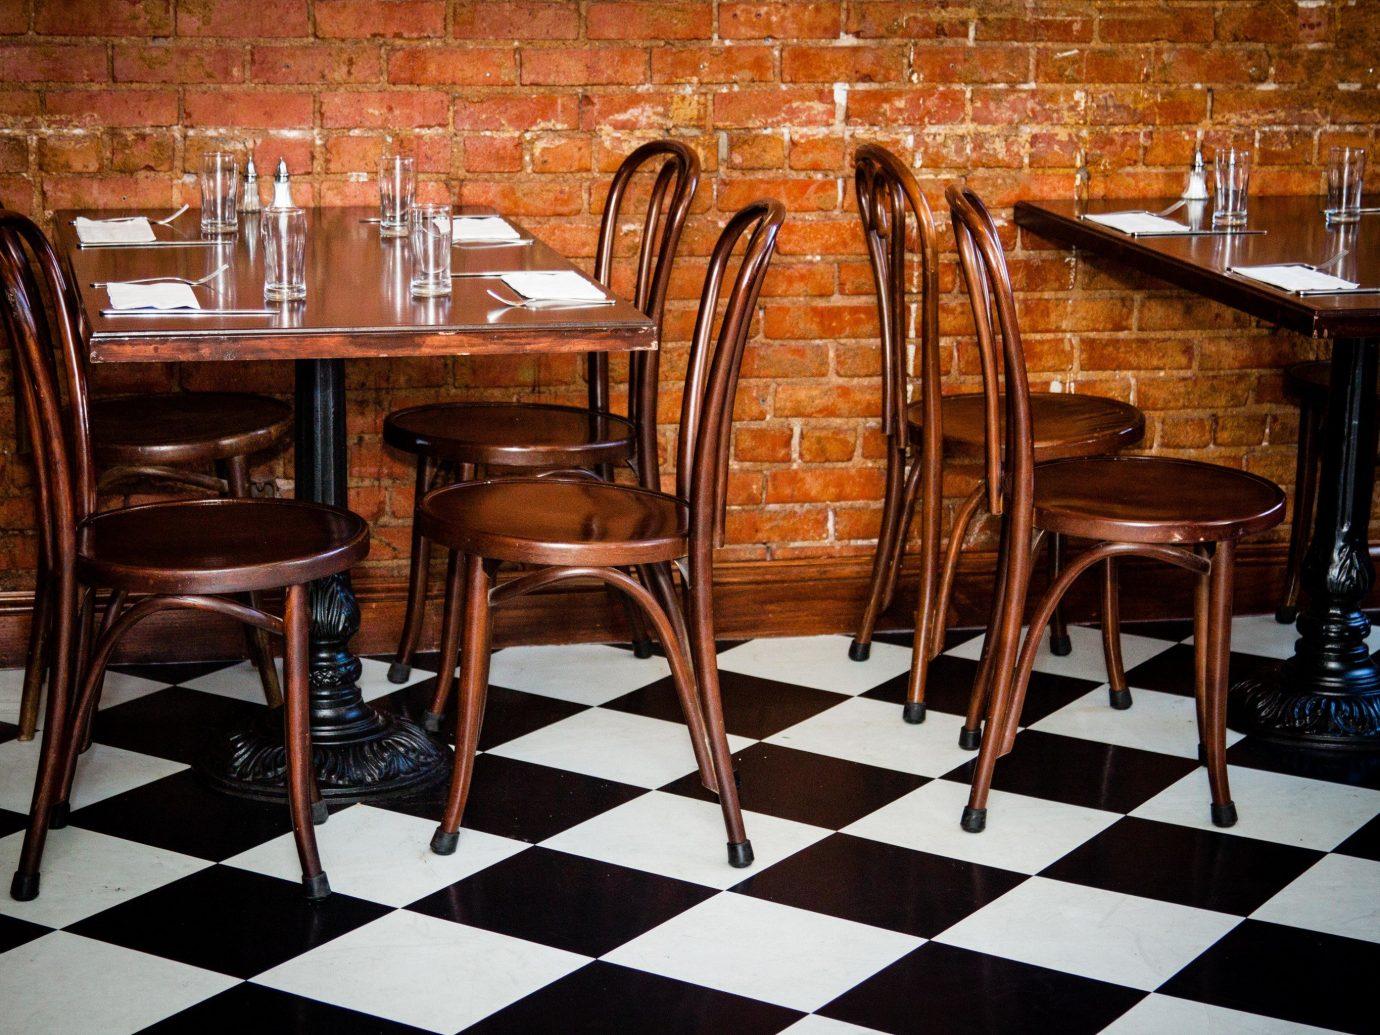 City Kansas City Midwest Trip Ideas floor chair table indoor furniture flooring Dining restaurant tile wood flooring hardwood wood interior design dining room laminate flooring dining table set